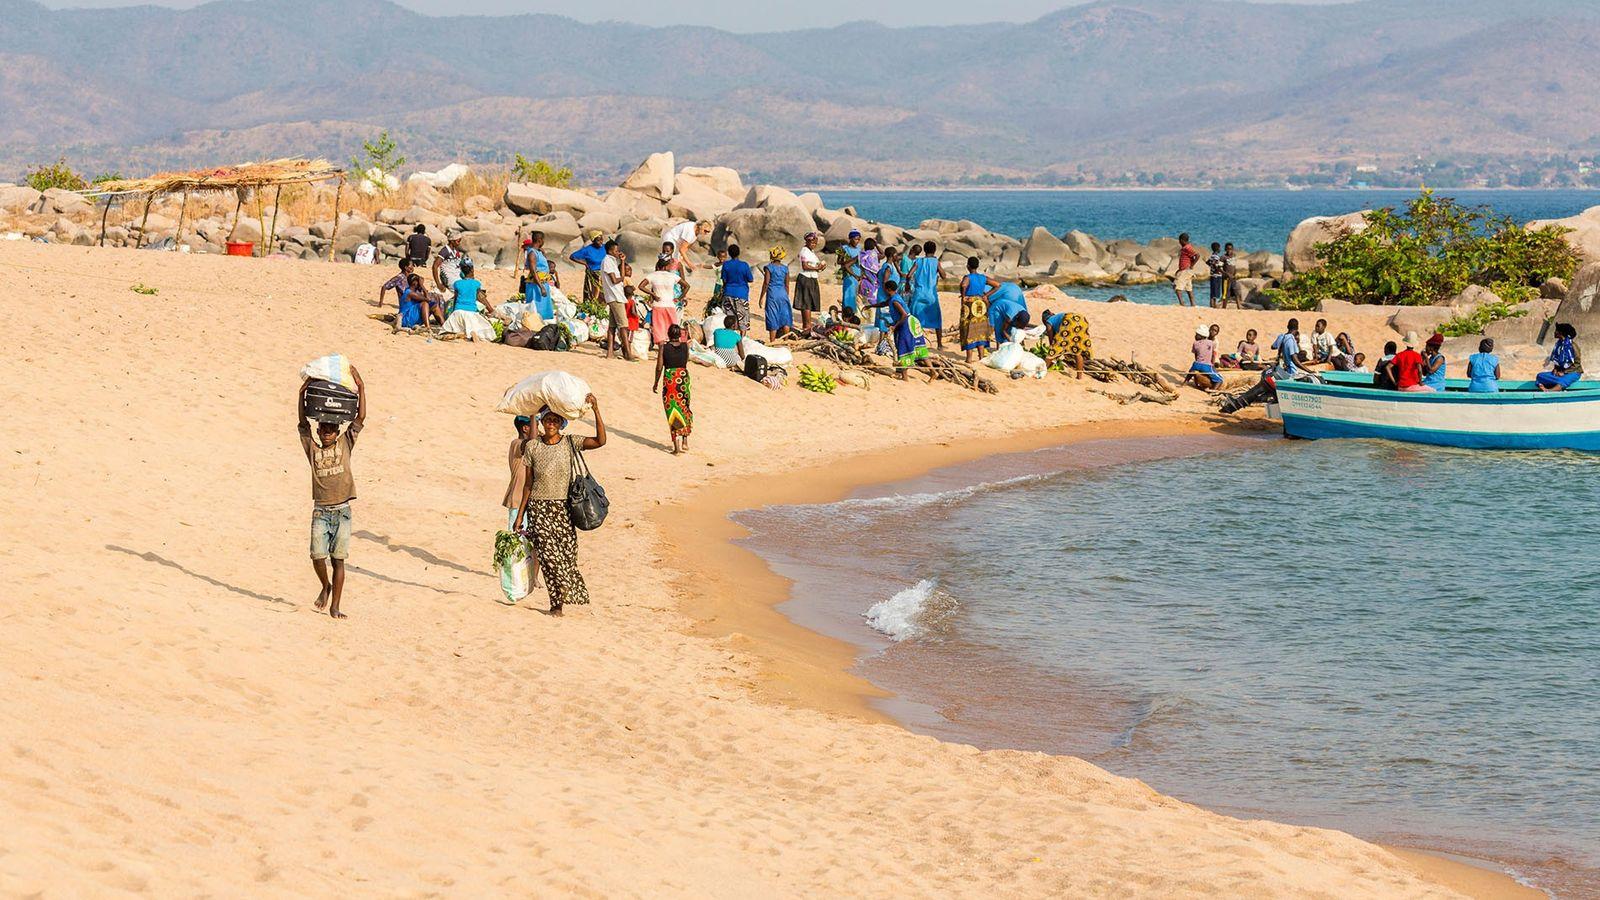 Passengers disembarking at Lake Malawi